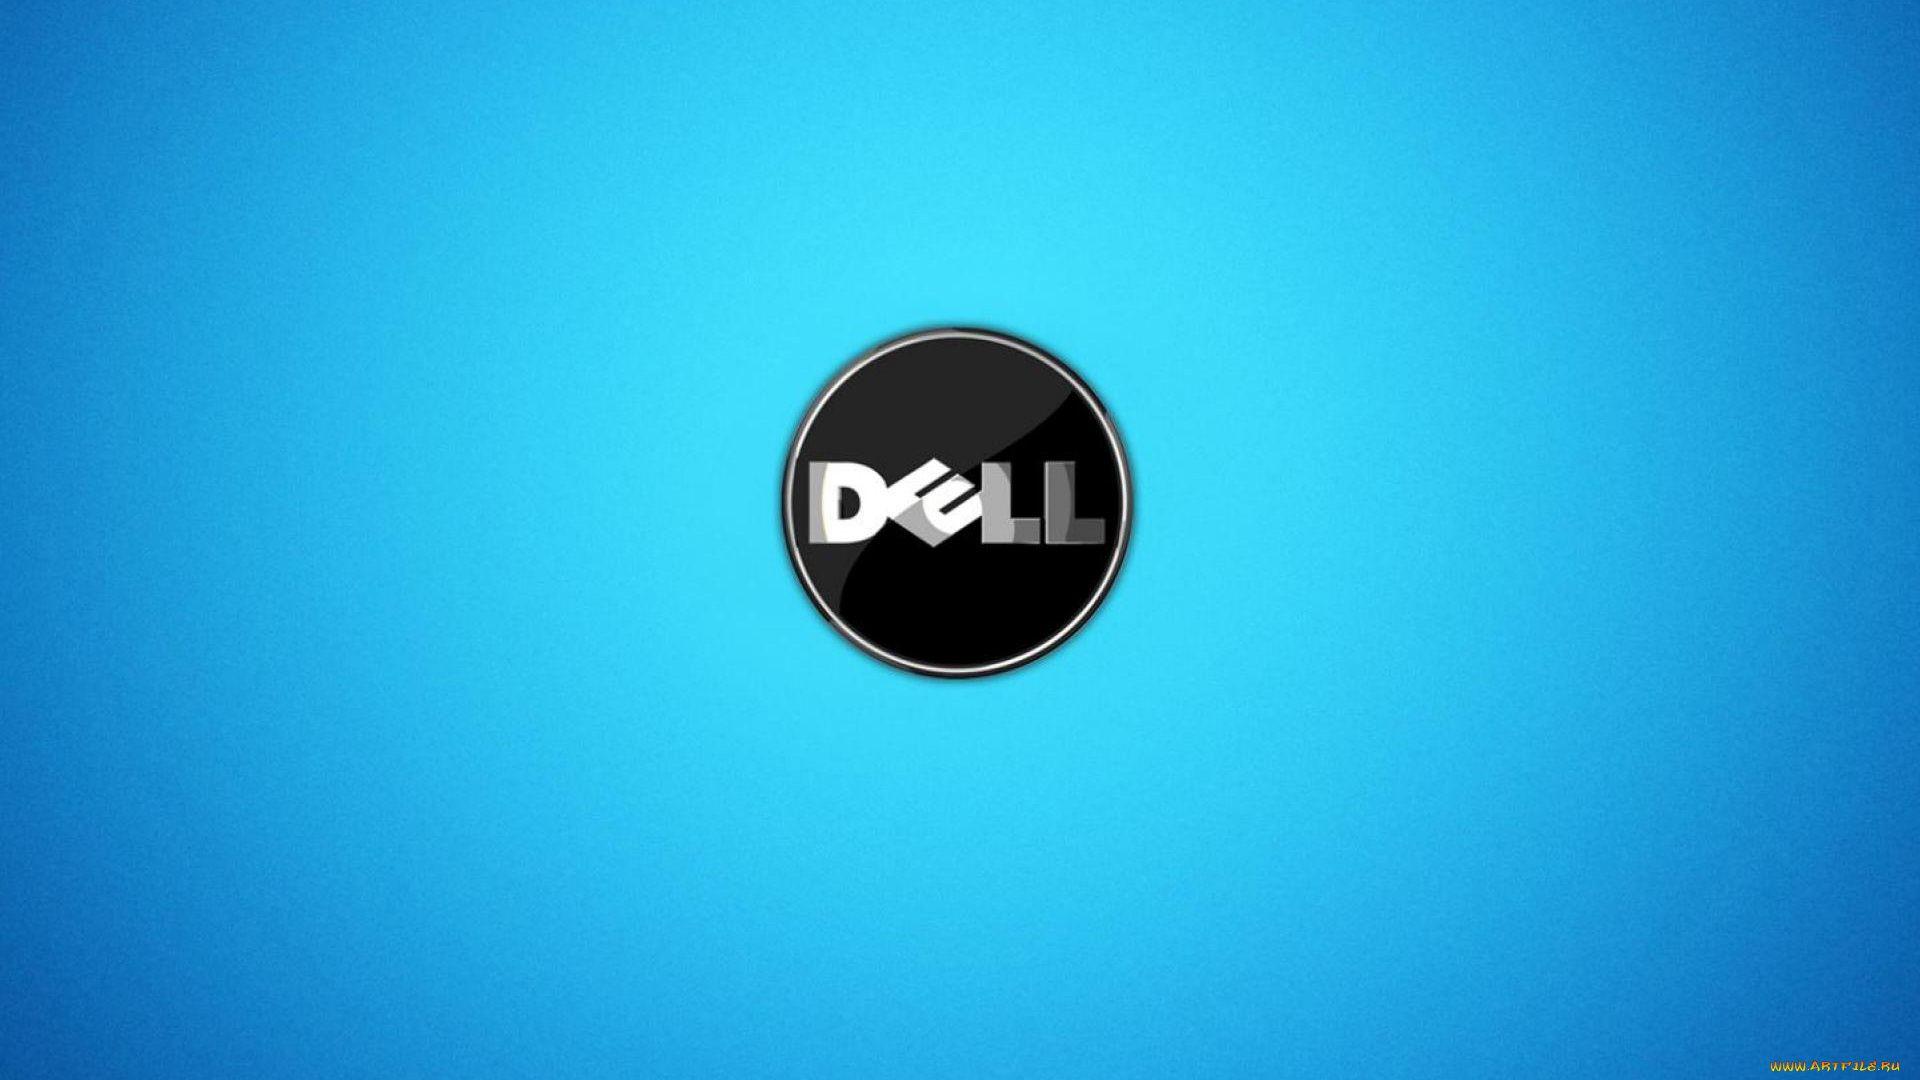 Dell free image